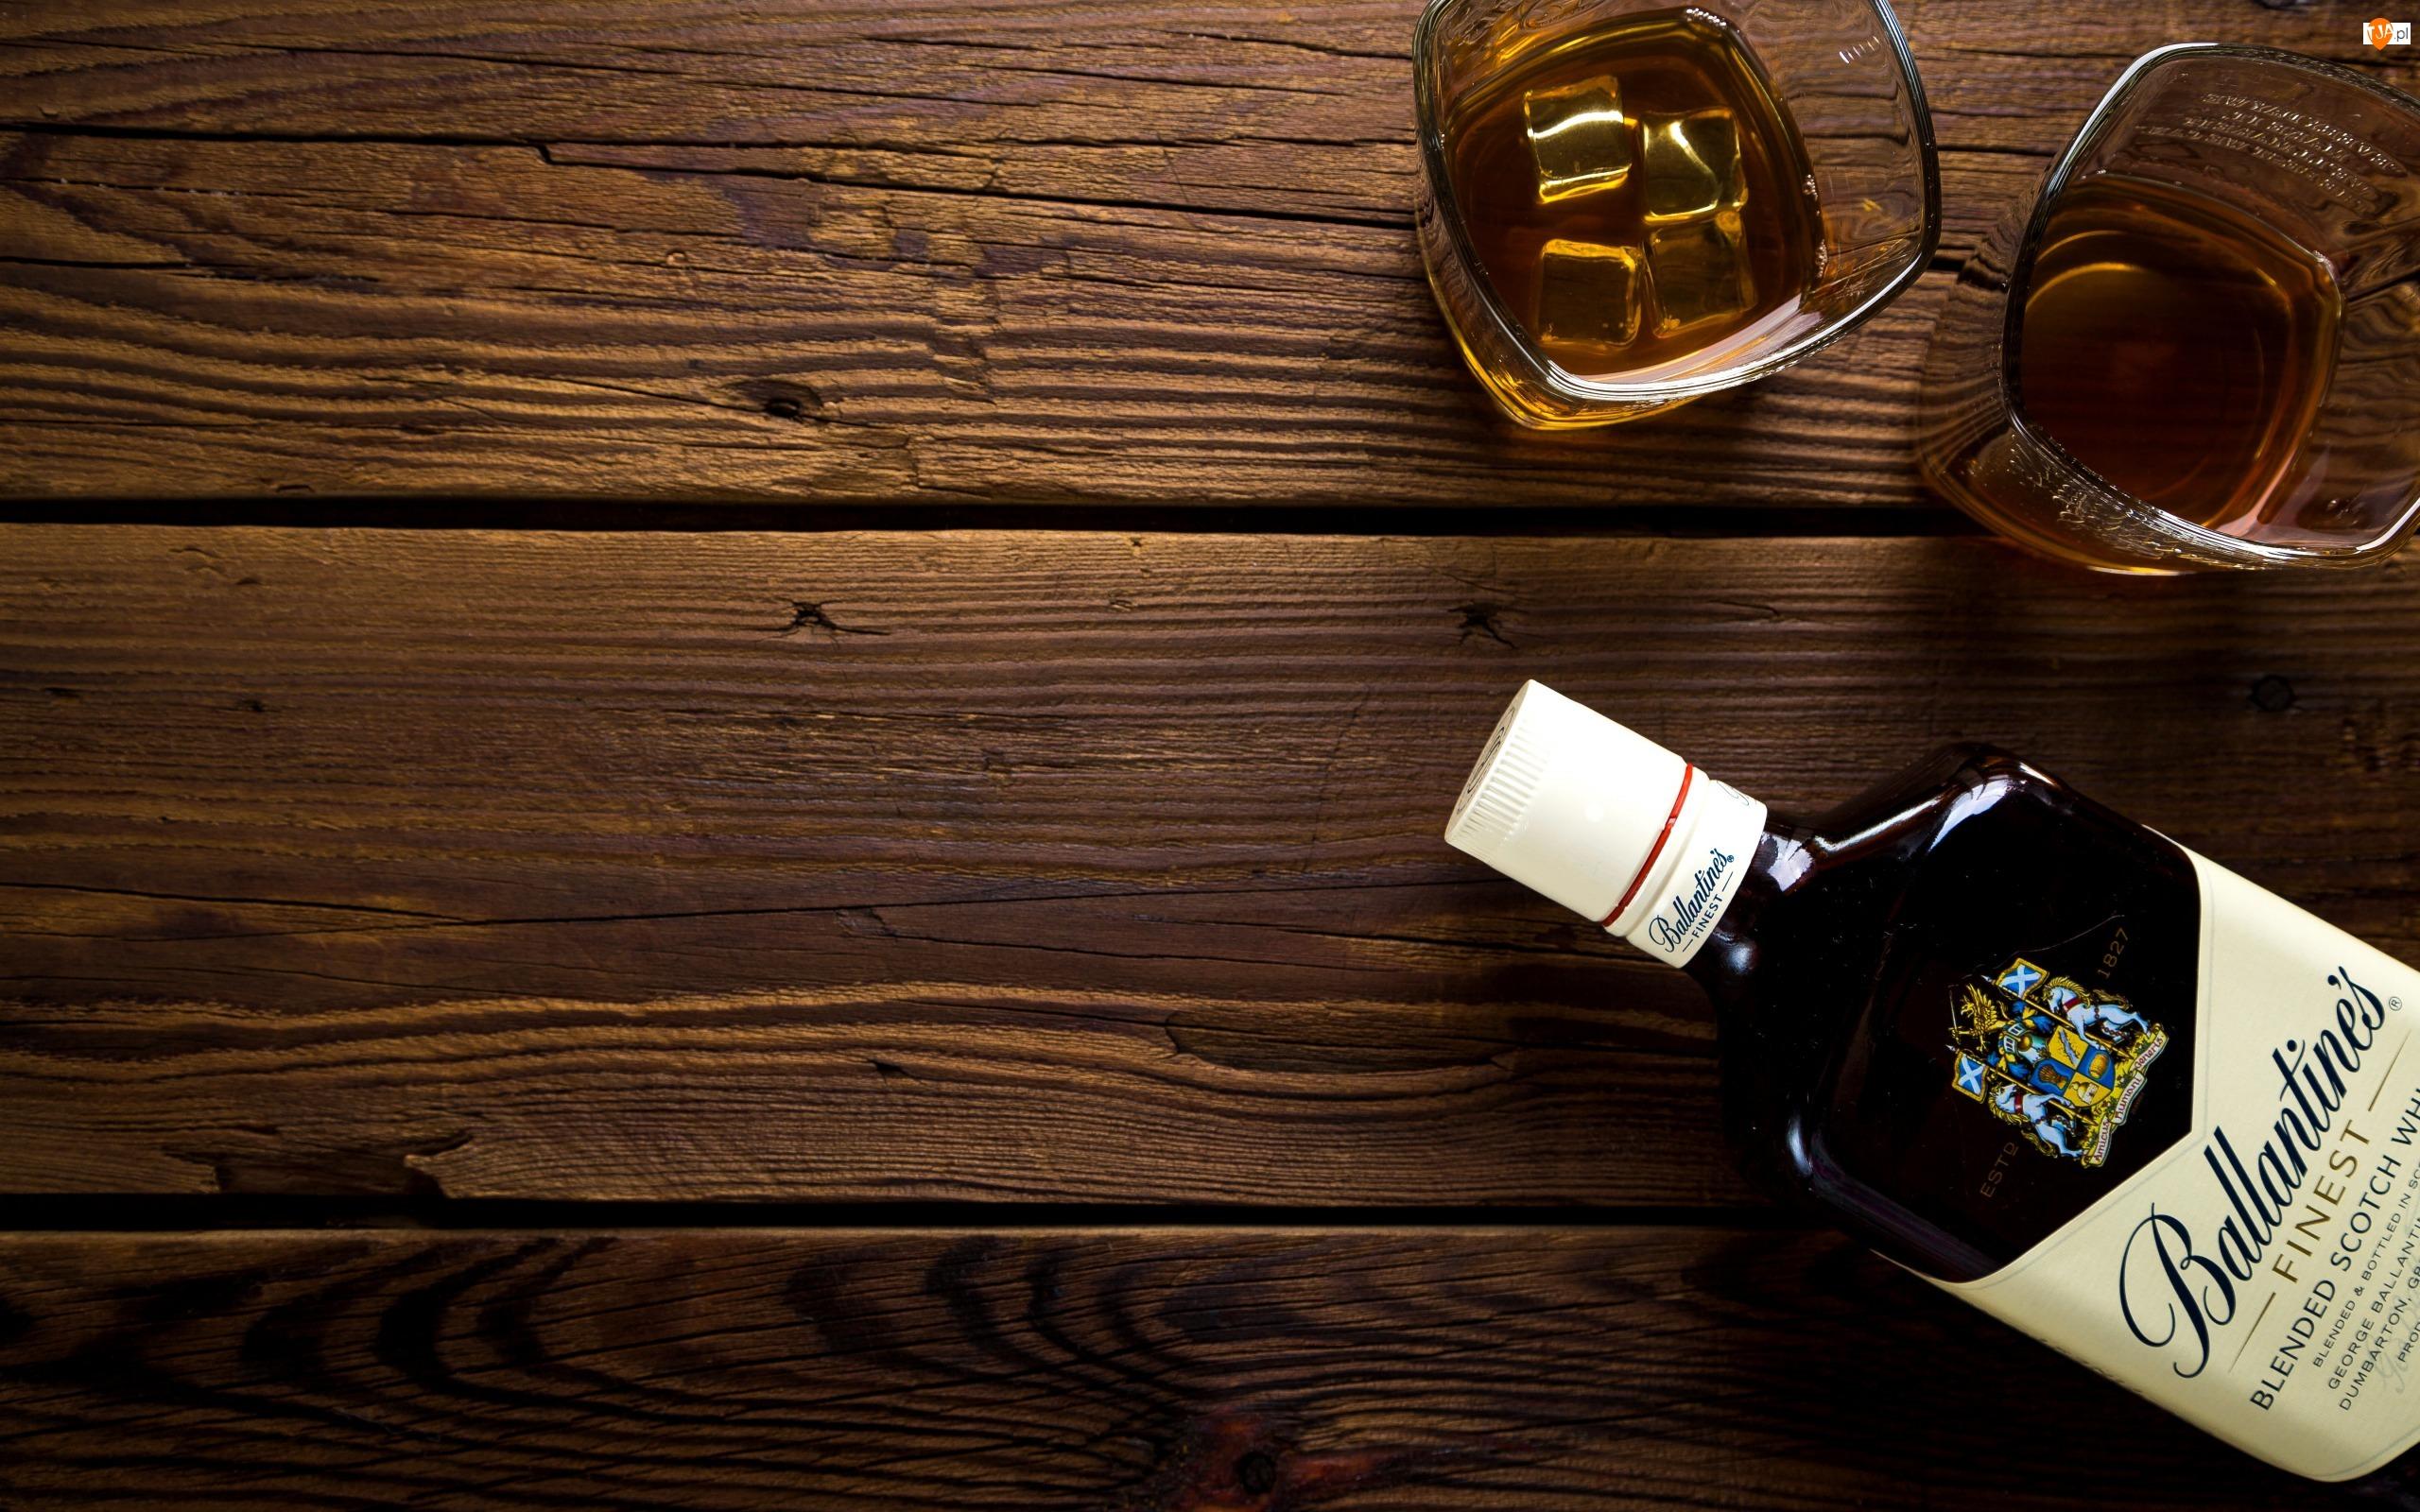 Dwa, Ballantines, Drinki, Whisky